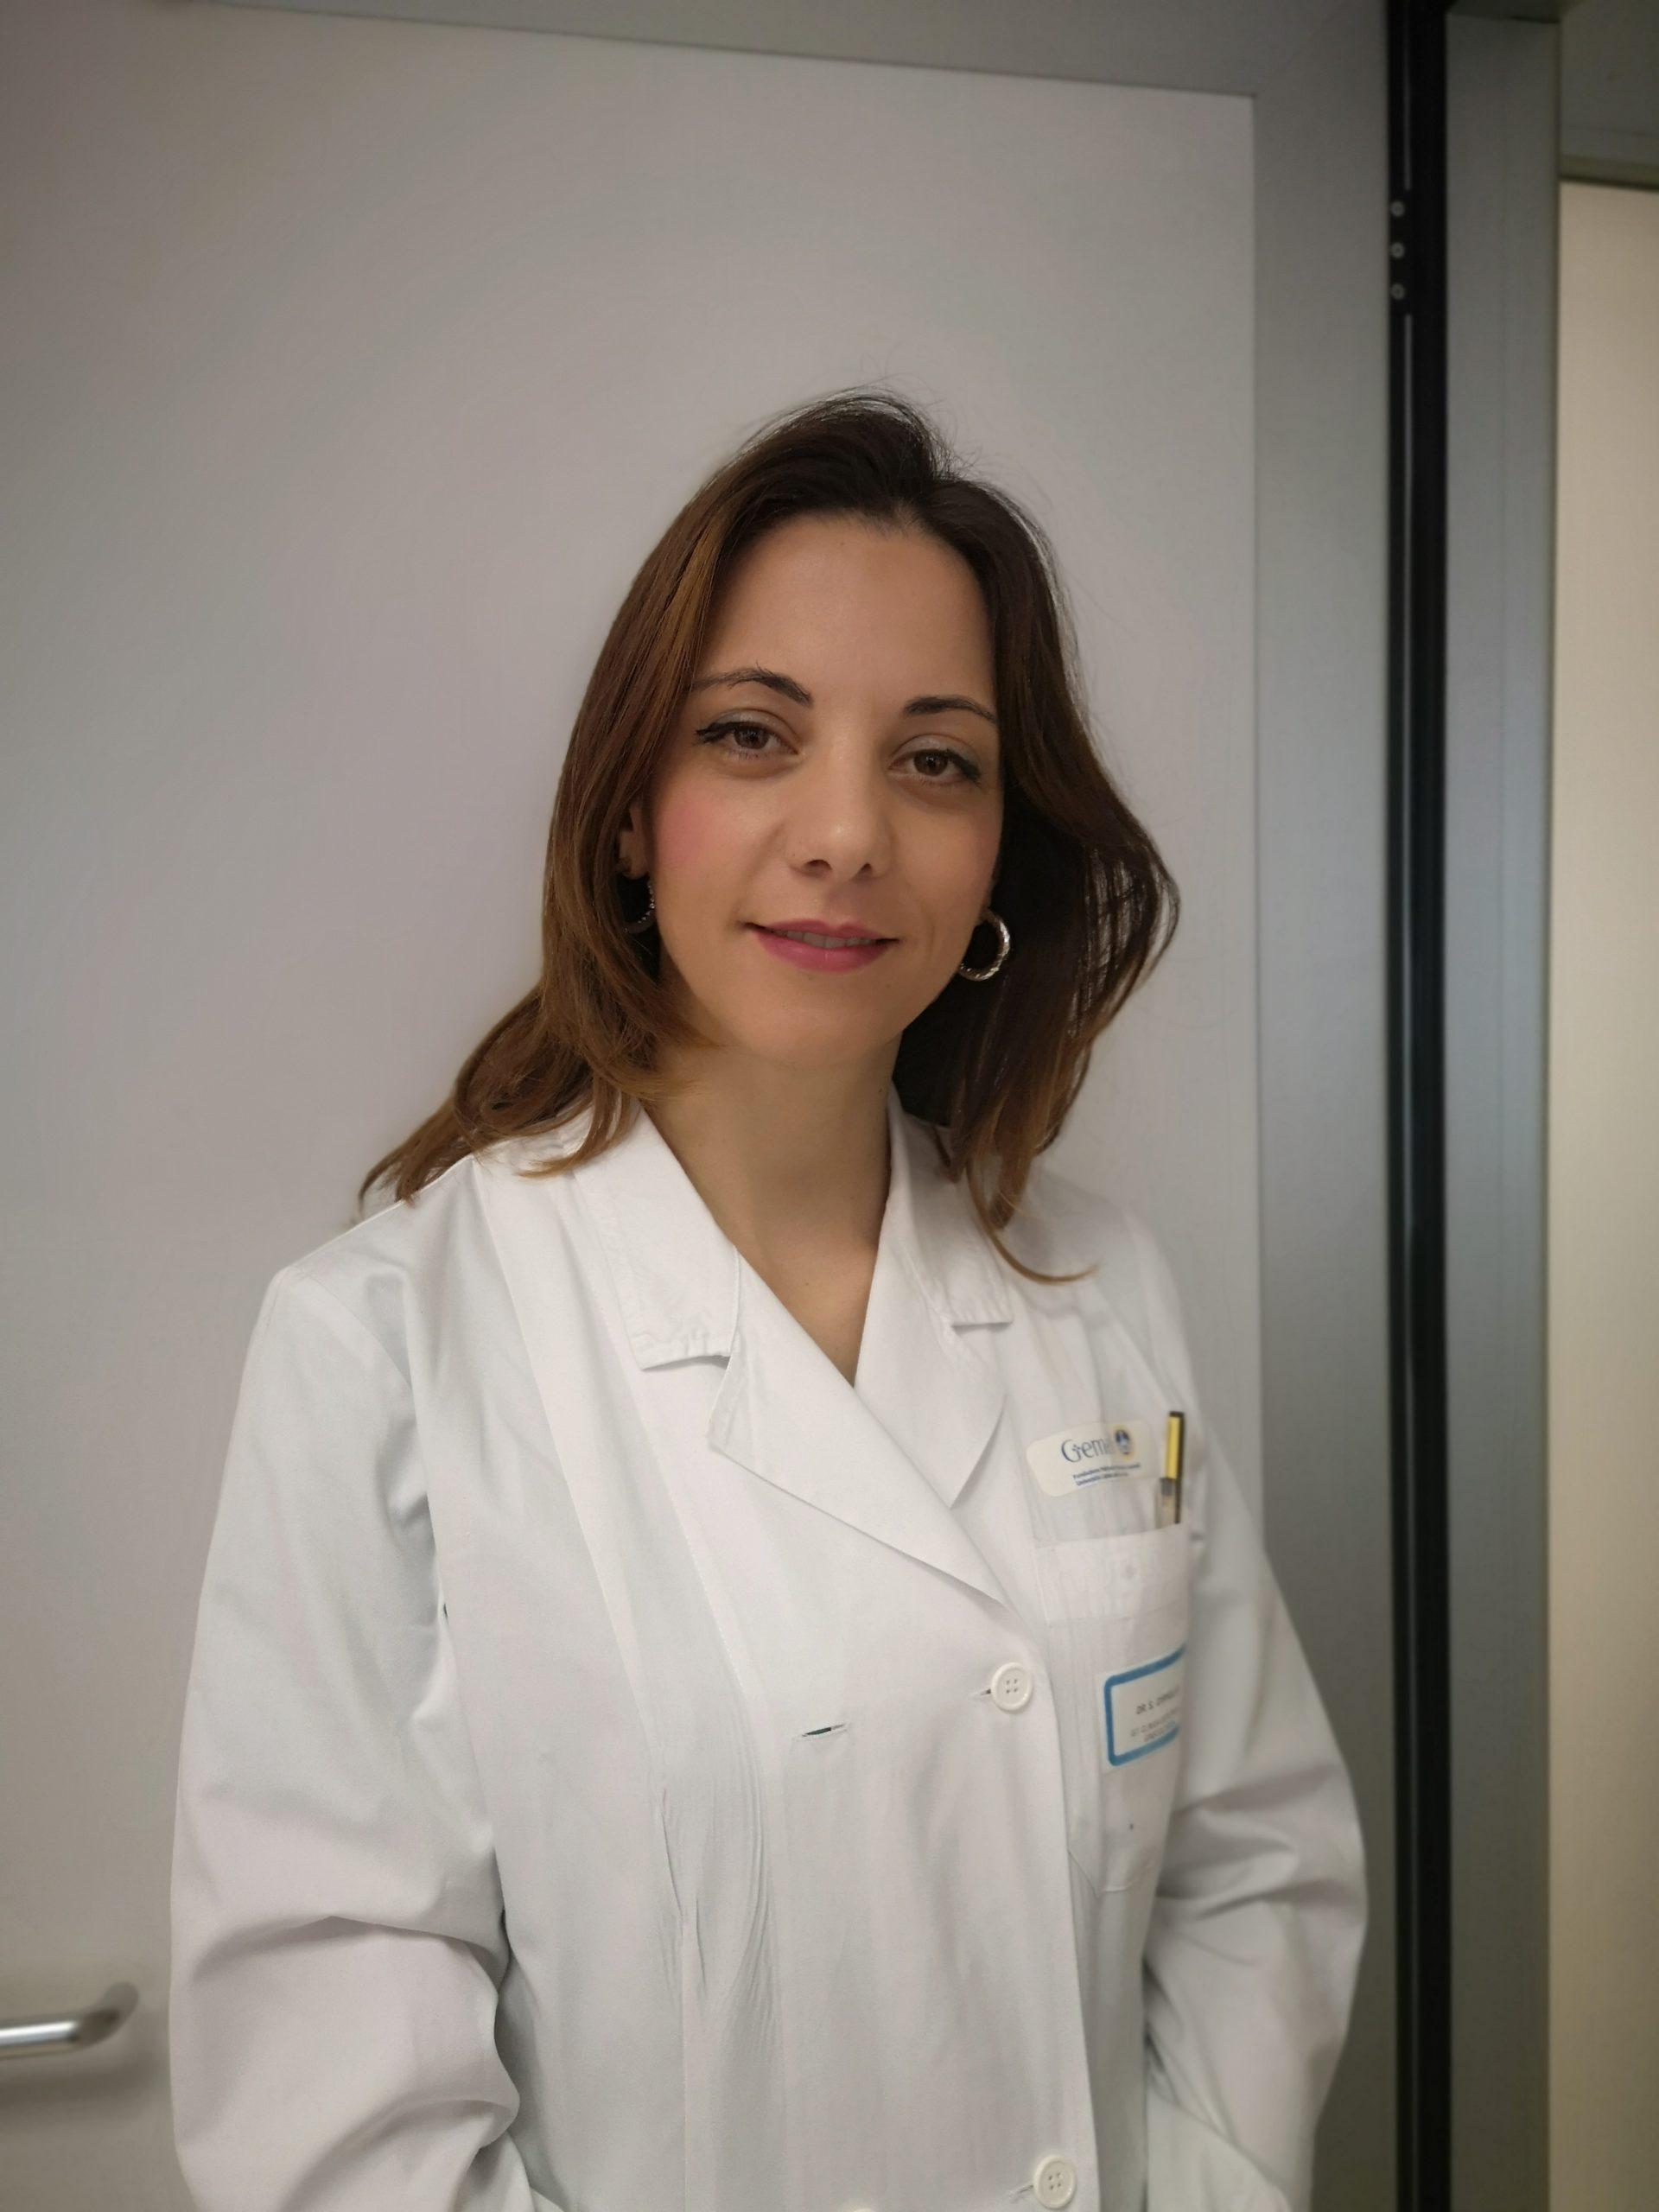 Dott.ssa SILVIA D'IPPOLITO